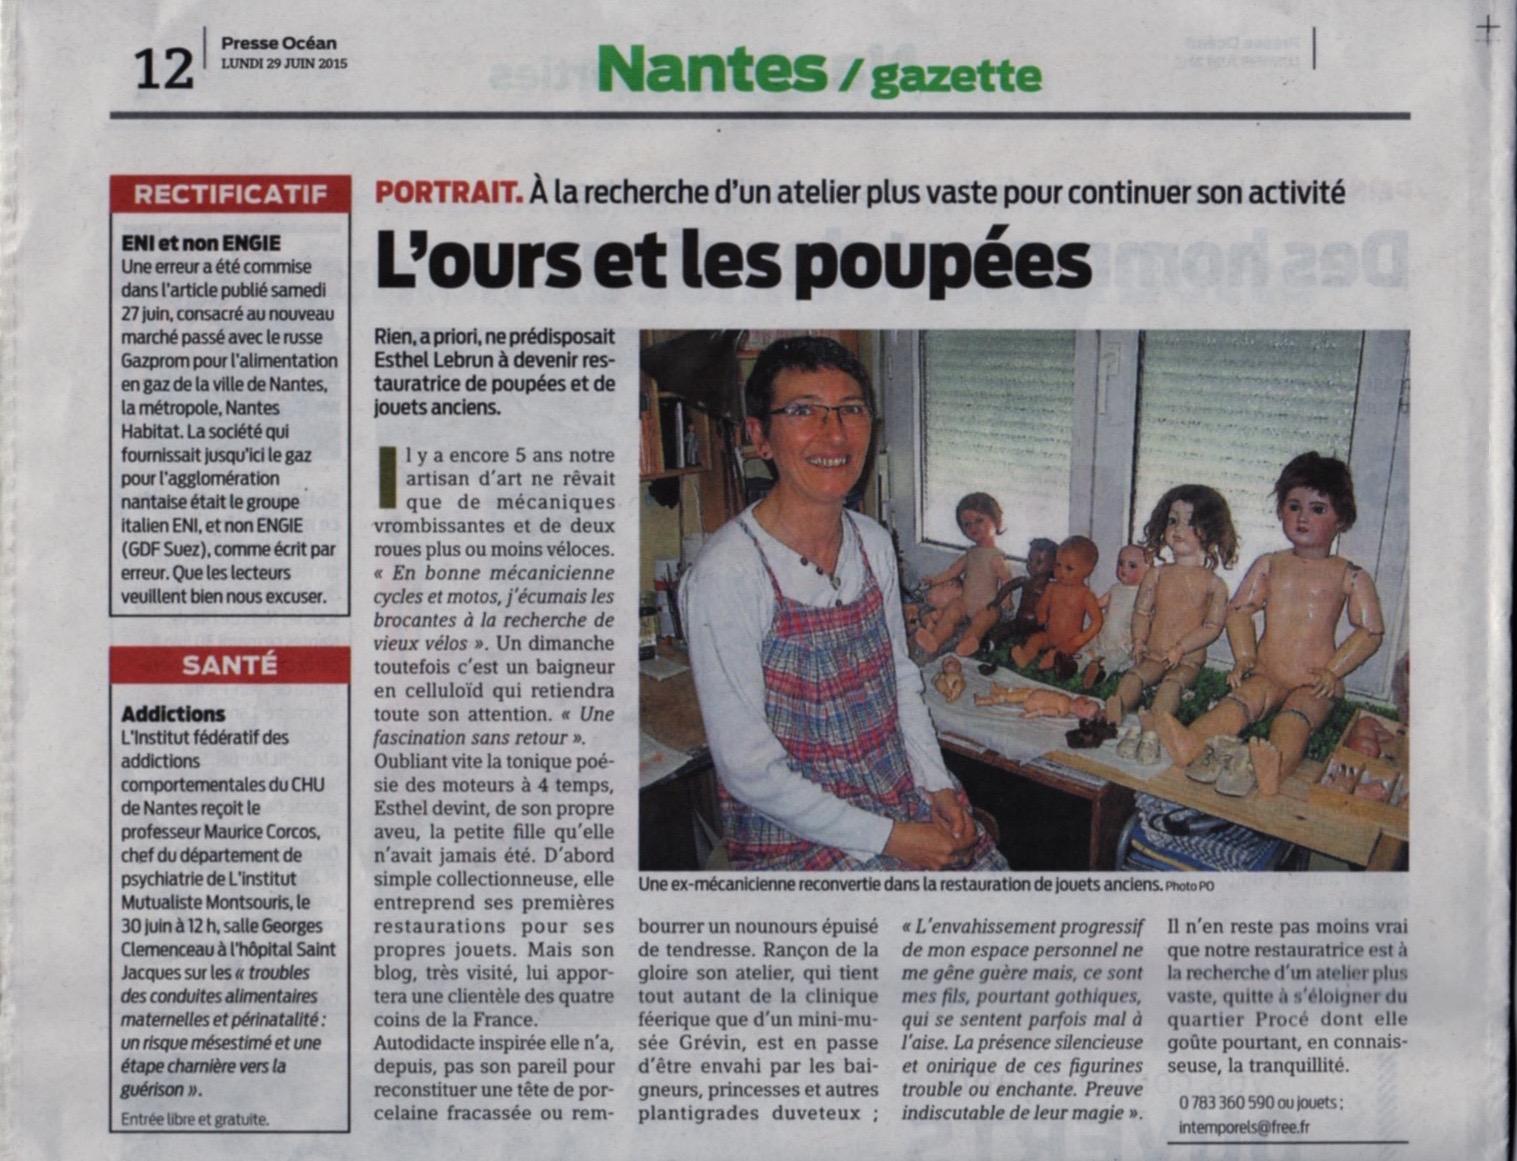 Article-Presse-Ocean